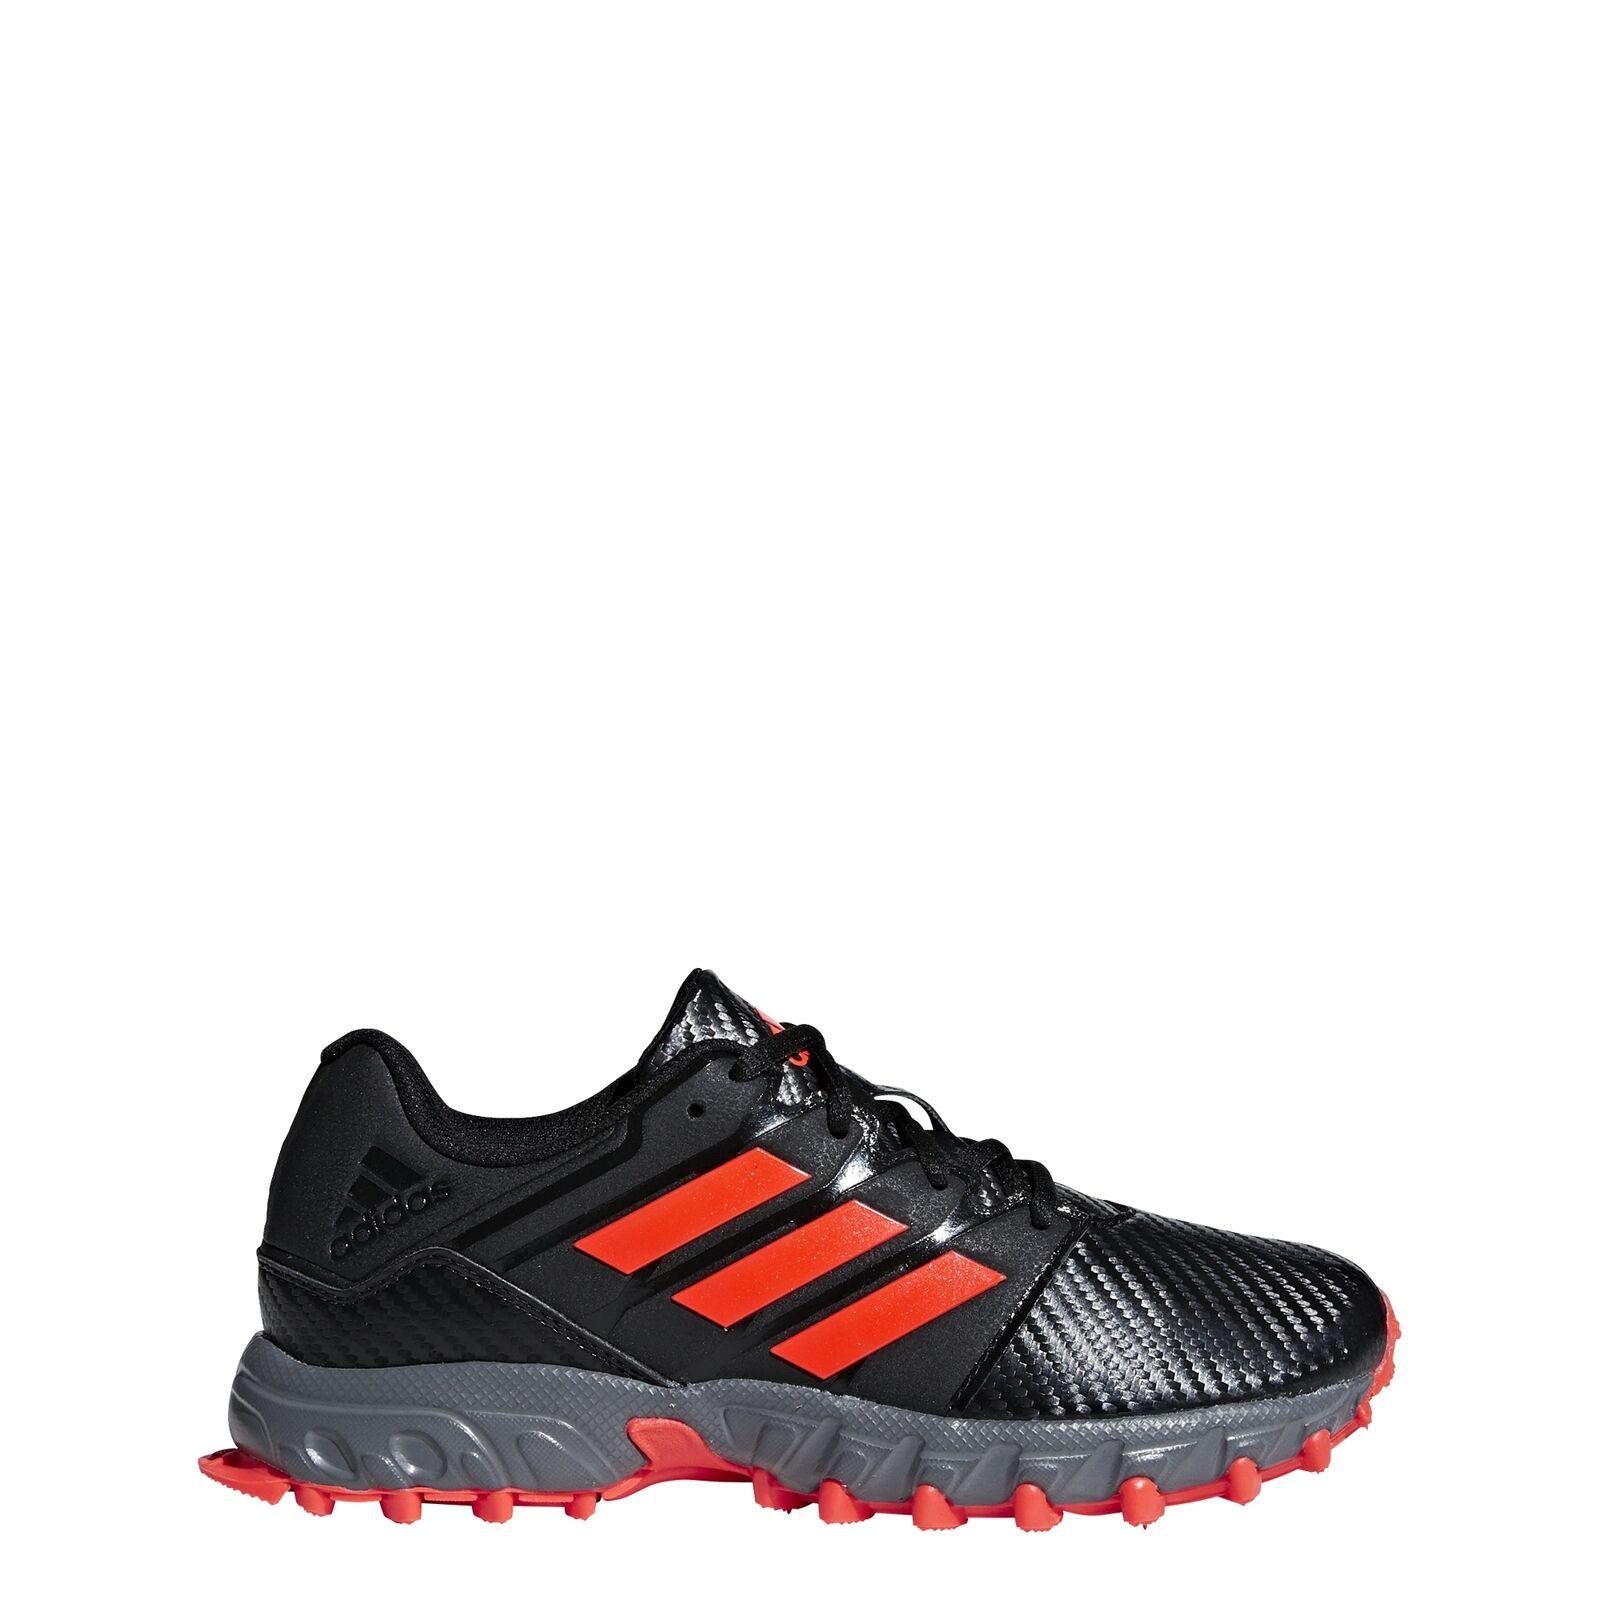 Adidas JR 18 19 19 19  Outdoor Feldhockeyschuhe für Kinder (schwarz rot grau) 0e7d27